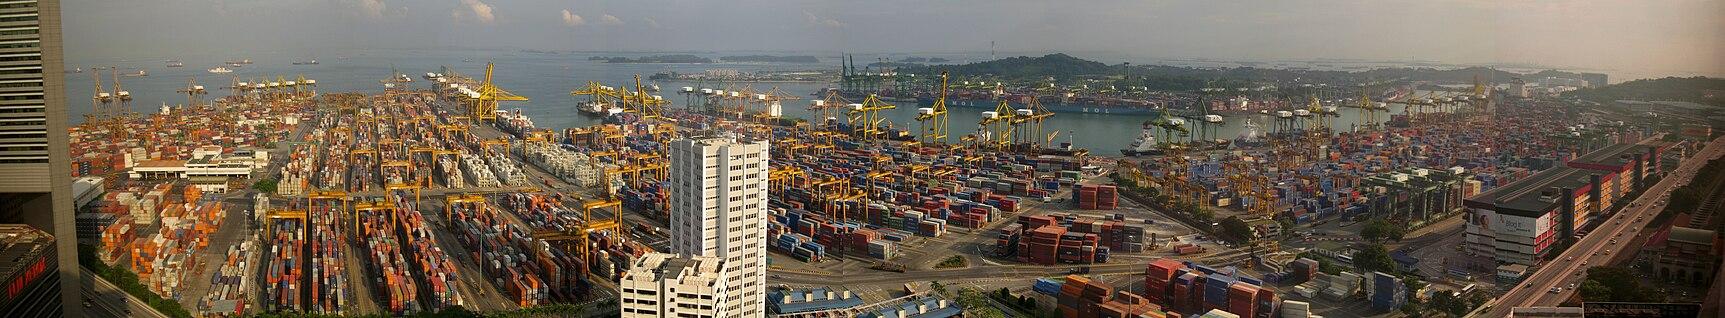 Singapore Havn Panorama